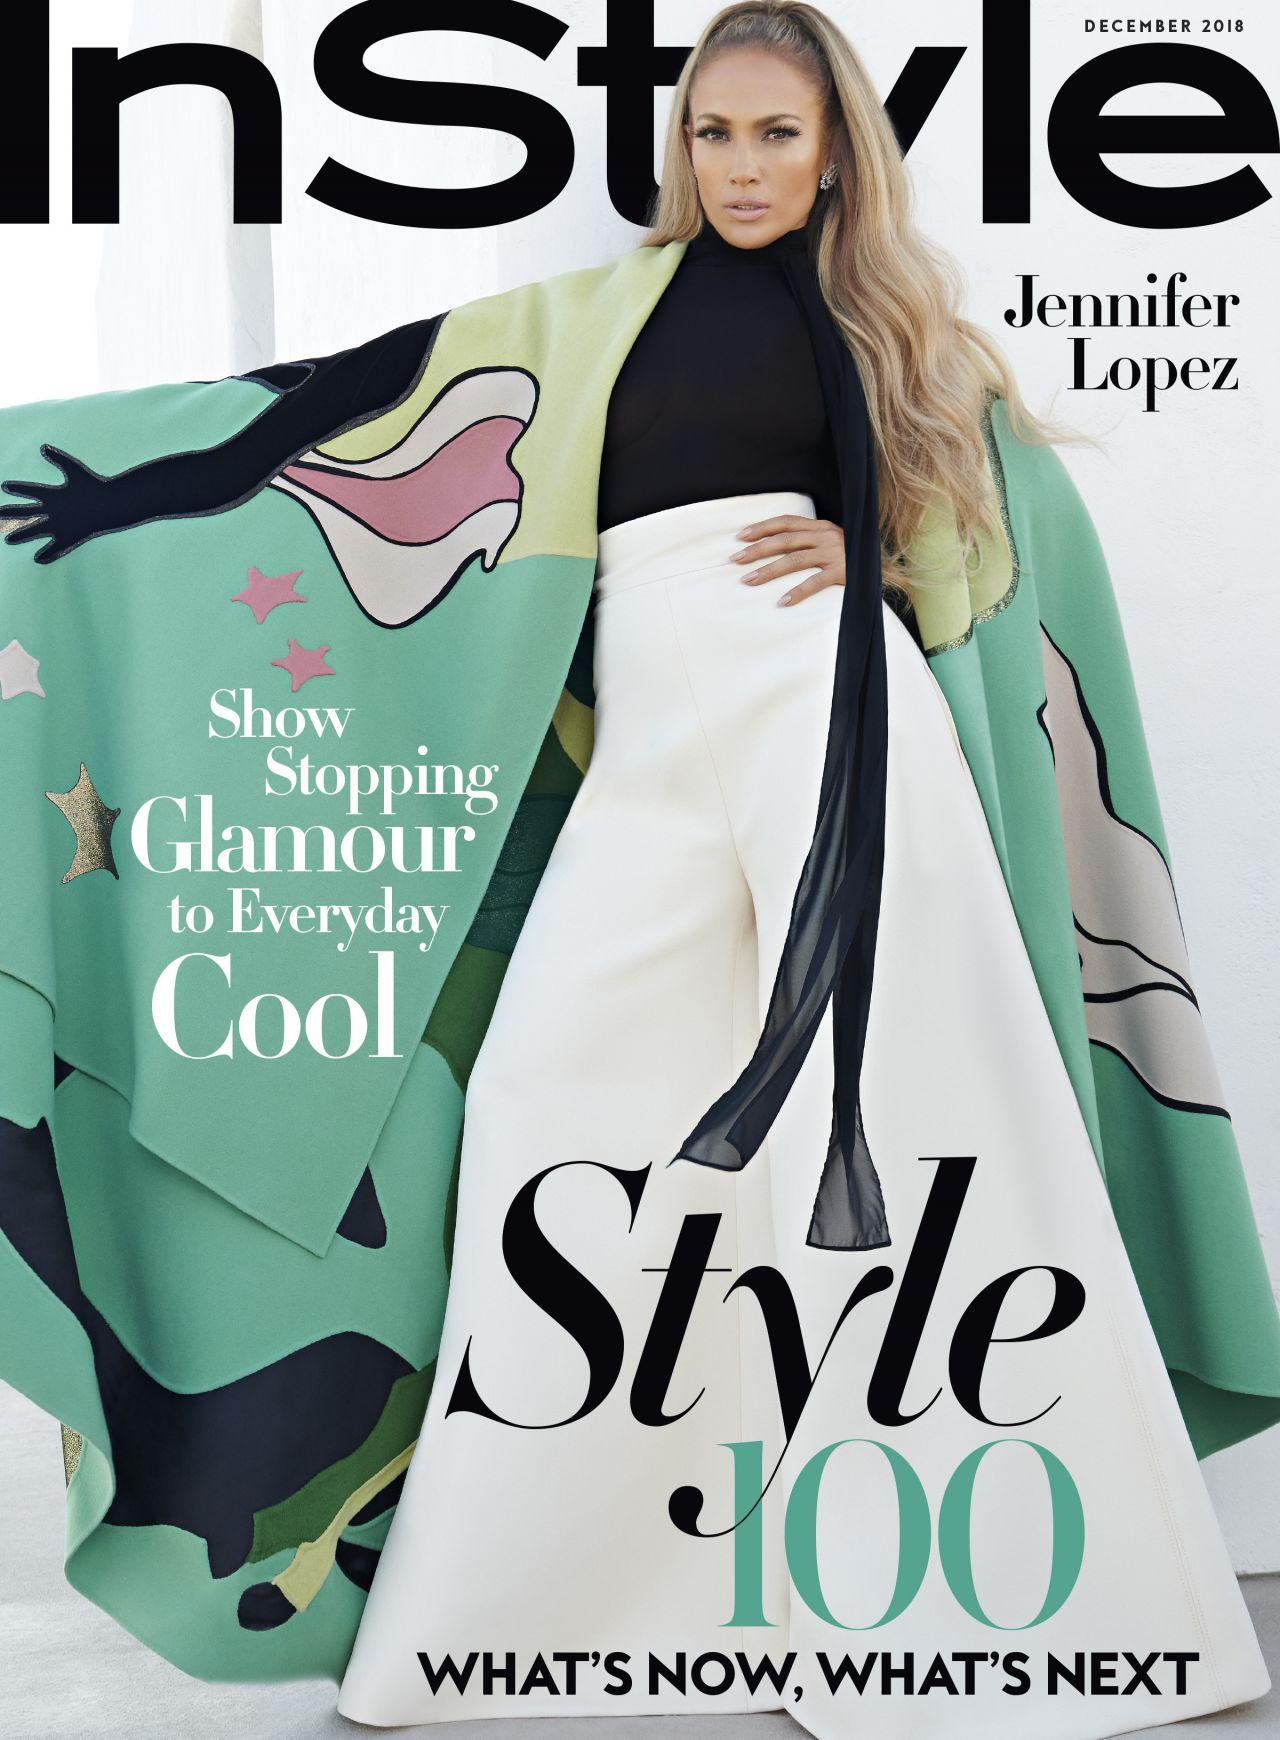 https://celebmafia.com/wp-content/uploads/2018/11/jennifer-lopez-instyle-magazine-2018-0.jpg